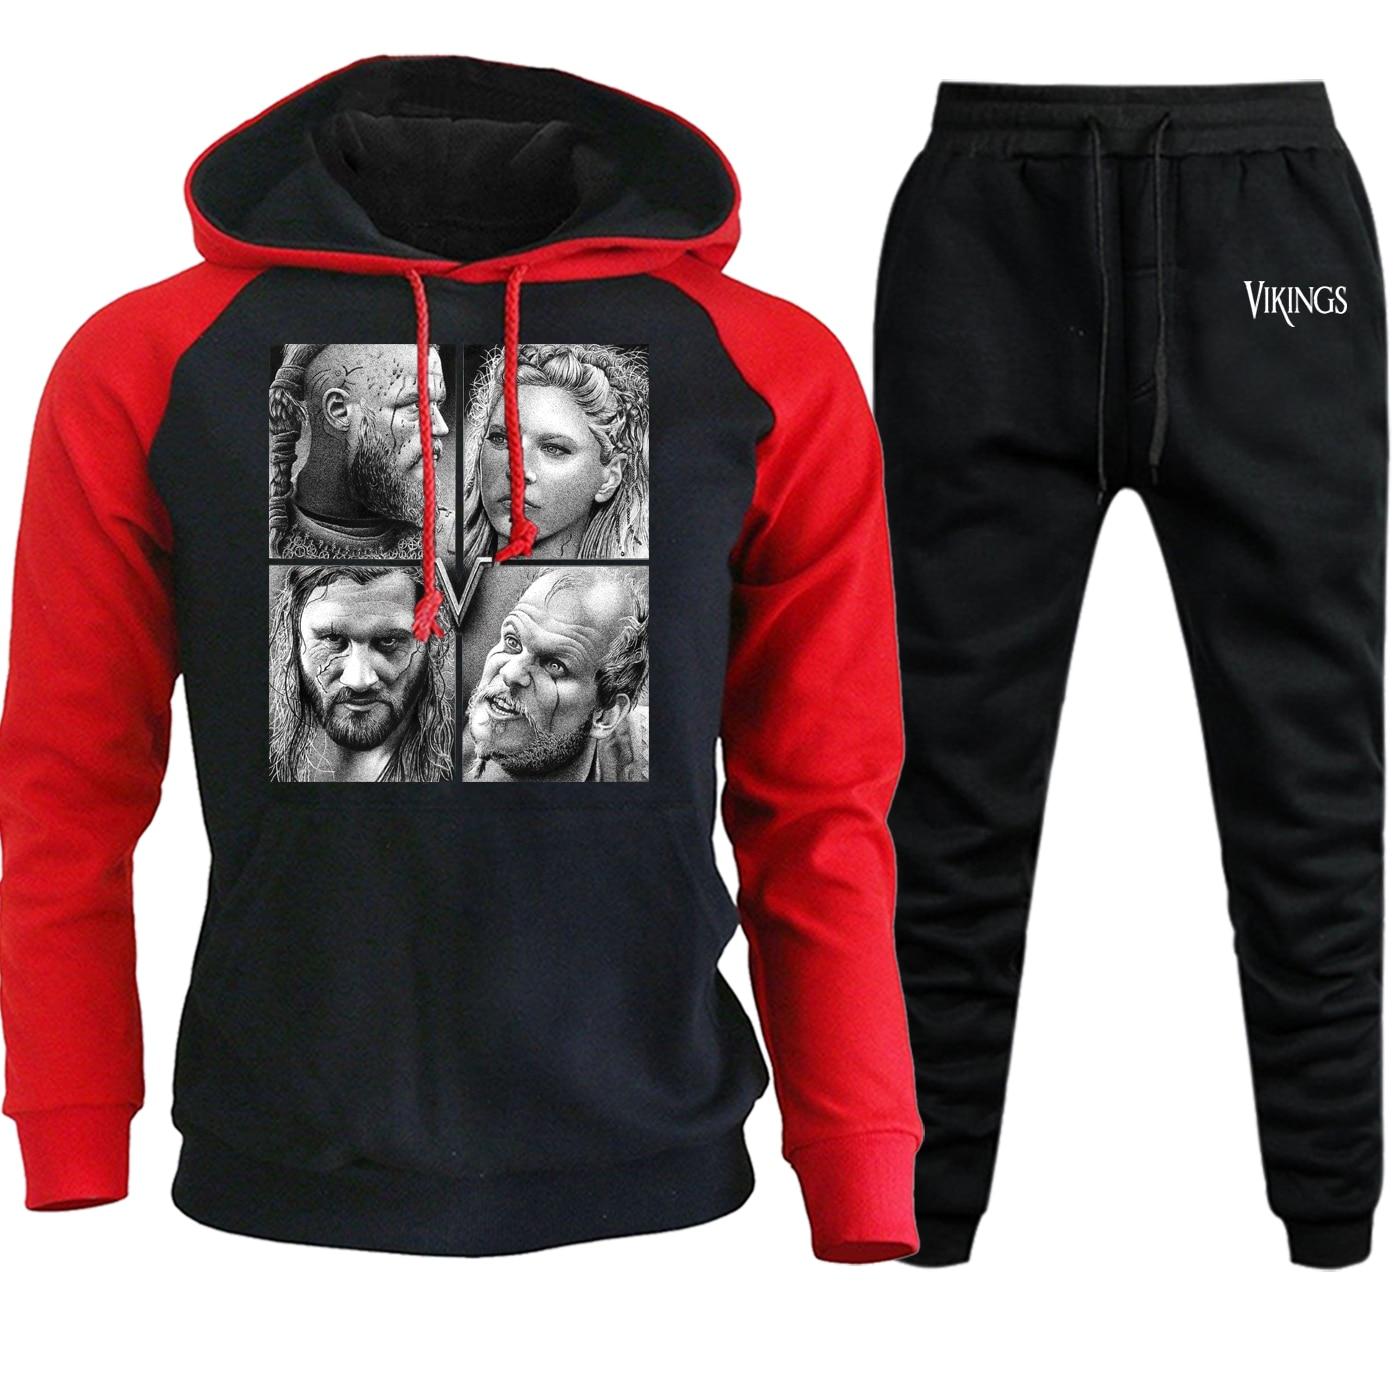 Streetwear Mens Hoodies Raglan Autumn Winter 2019 TV Show Vikings Suit Male Fleece Hooded Vintage Pullover+Pants 2 Piece Set